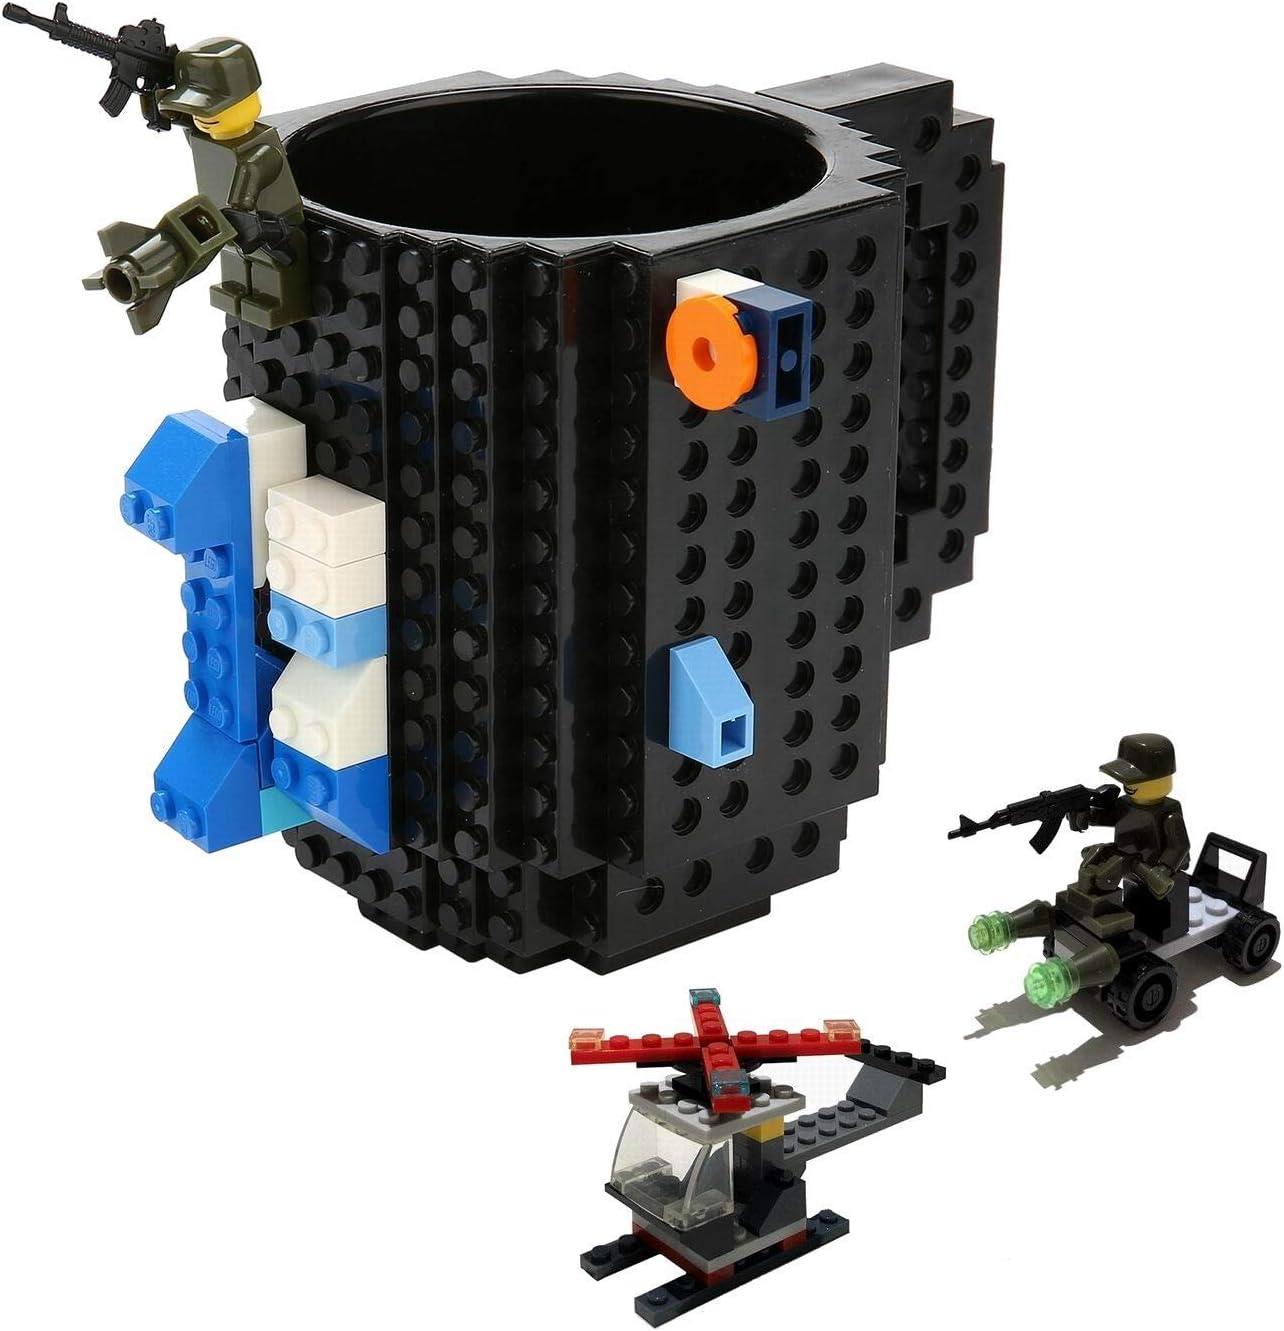 Fun Brick Mug-FUBARBAR Creative Building 12oz Coffee Cup, Build on Blocks Desk Drinkware, Funny Toy for Kid Birthday Gift, Christmas, Party, Xmas, 3Pack Blocks (Black)